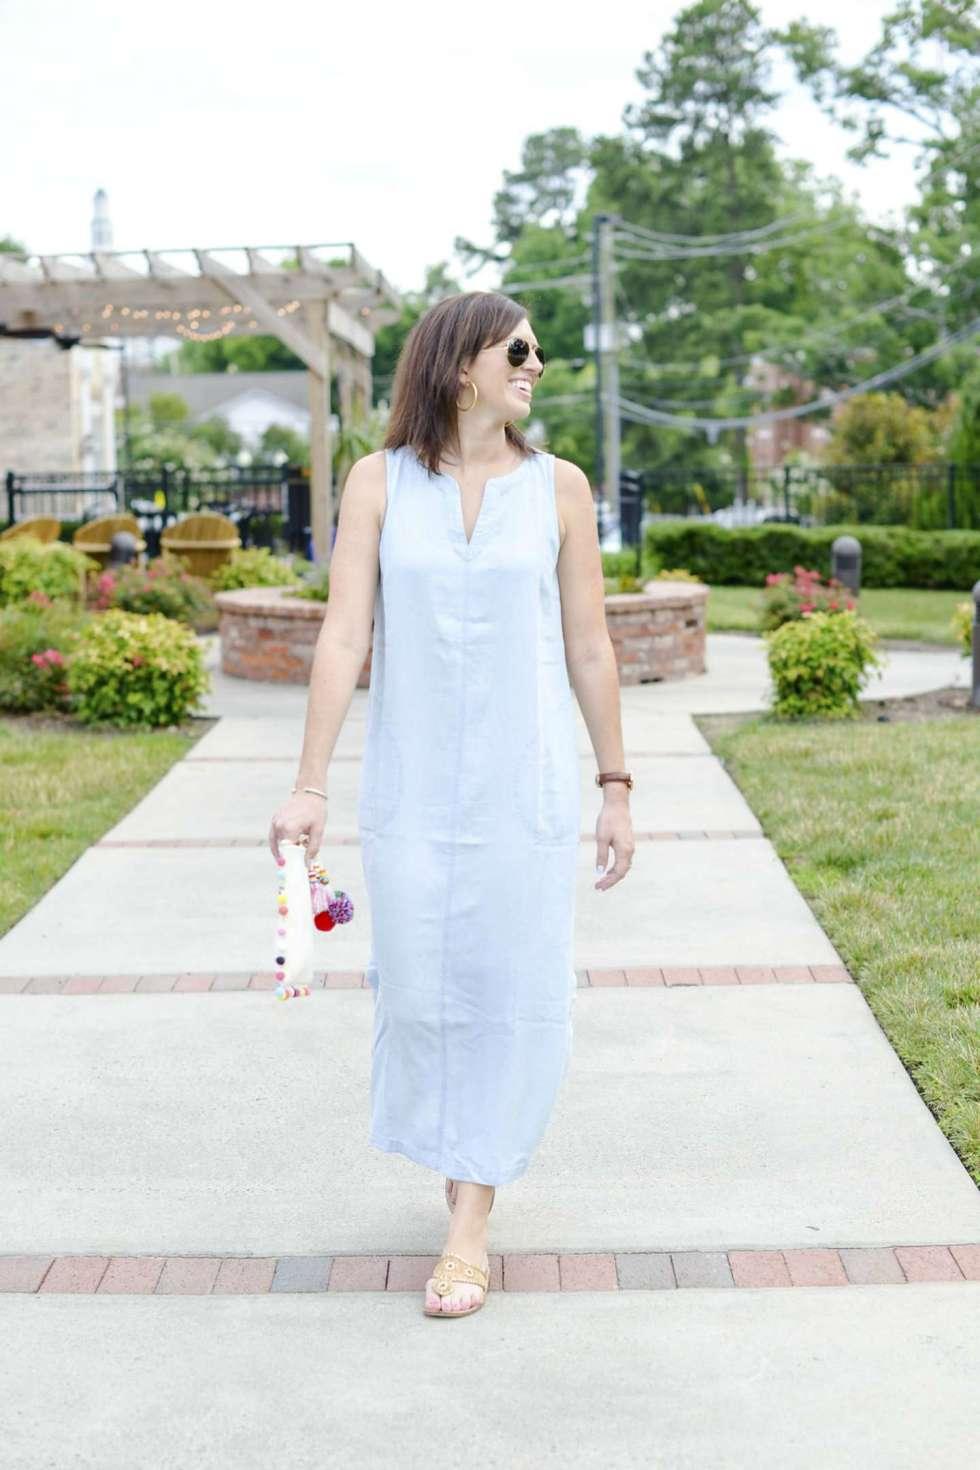 Chambray Maxi Dress + a Tassel Clutch - @mbg0112 - I'm Fixin' To